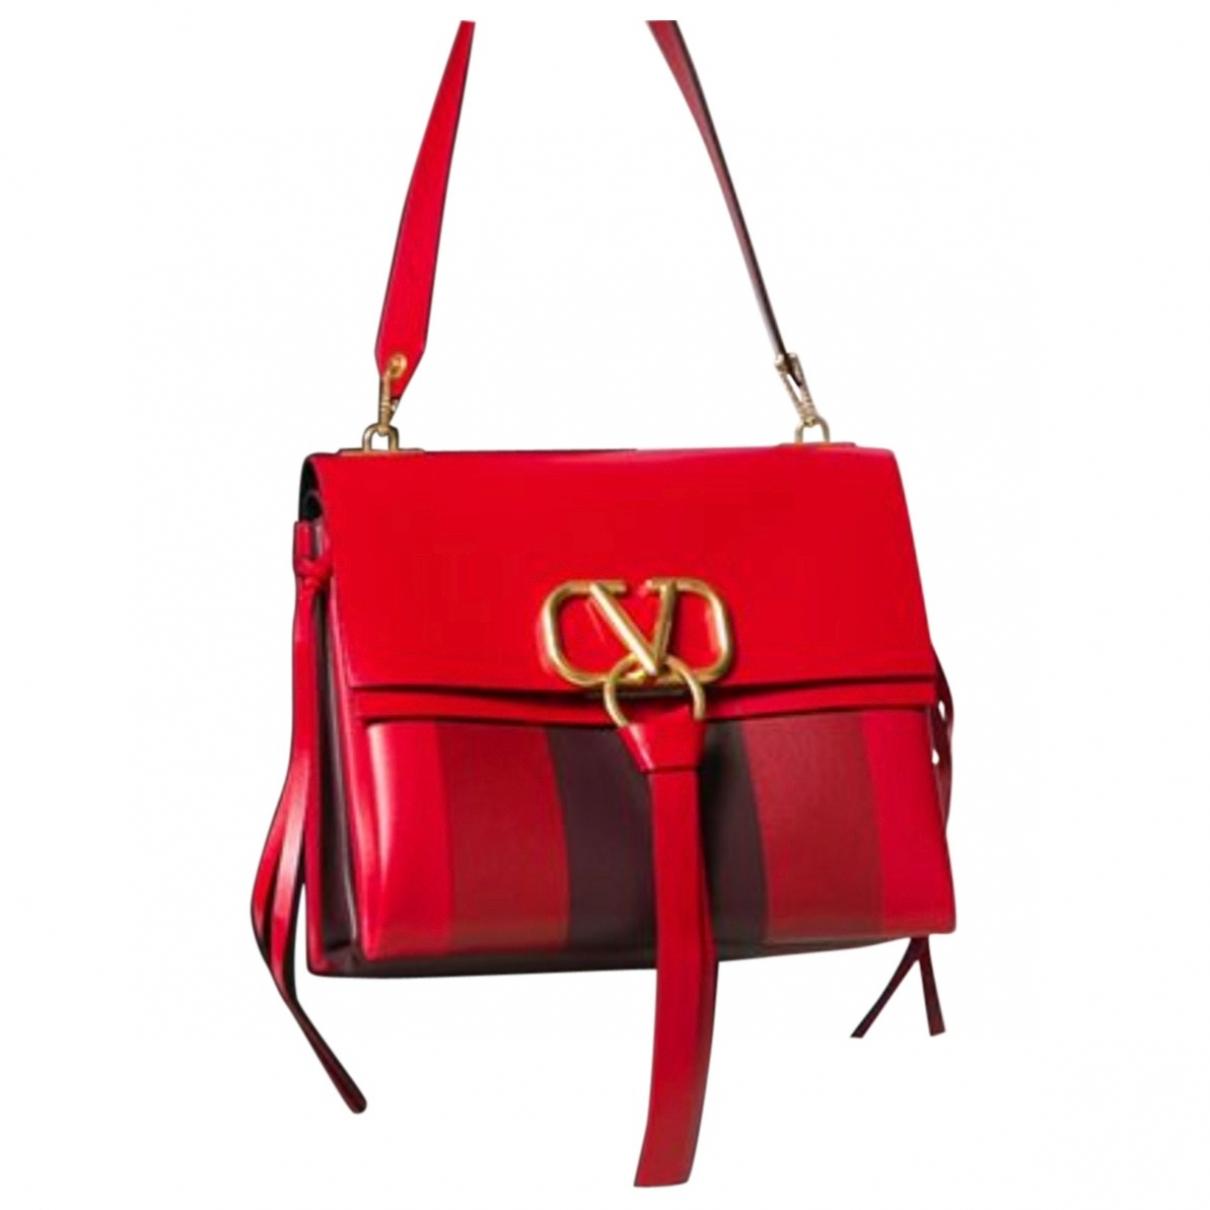 Valentino Garavani Vring Handtasche in  Rot Leder